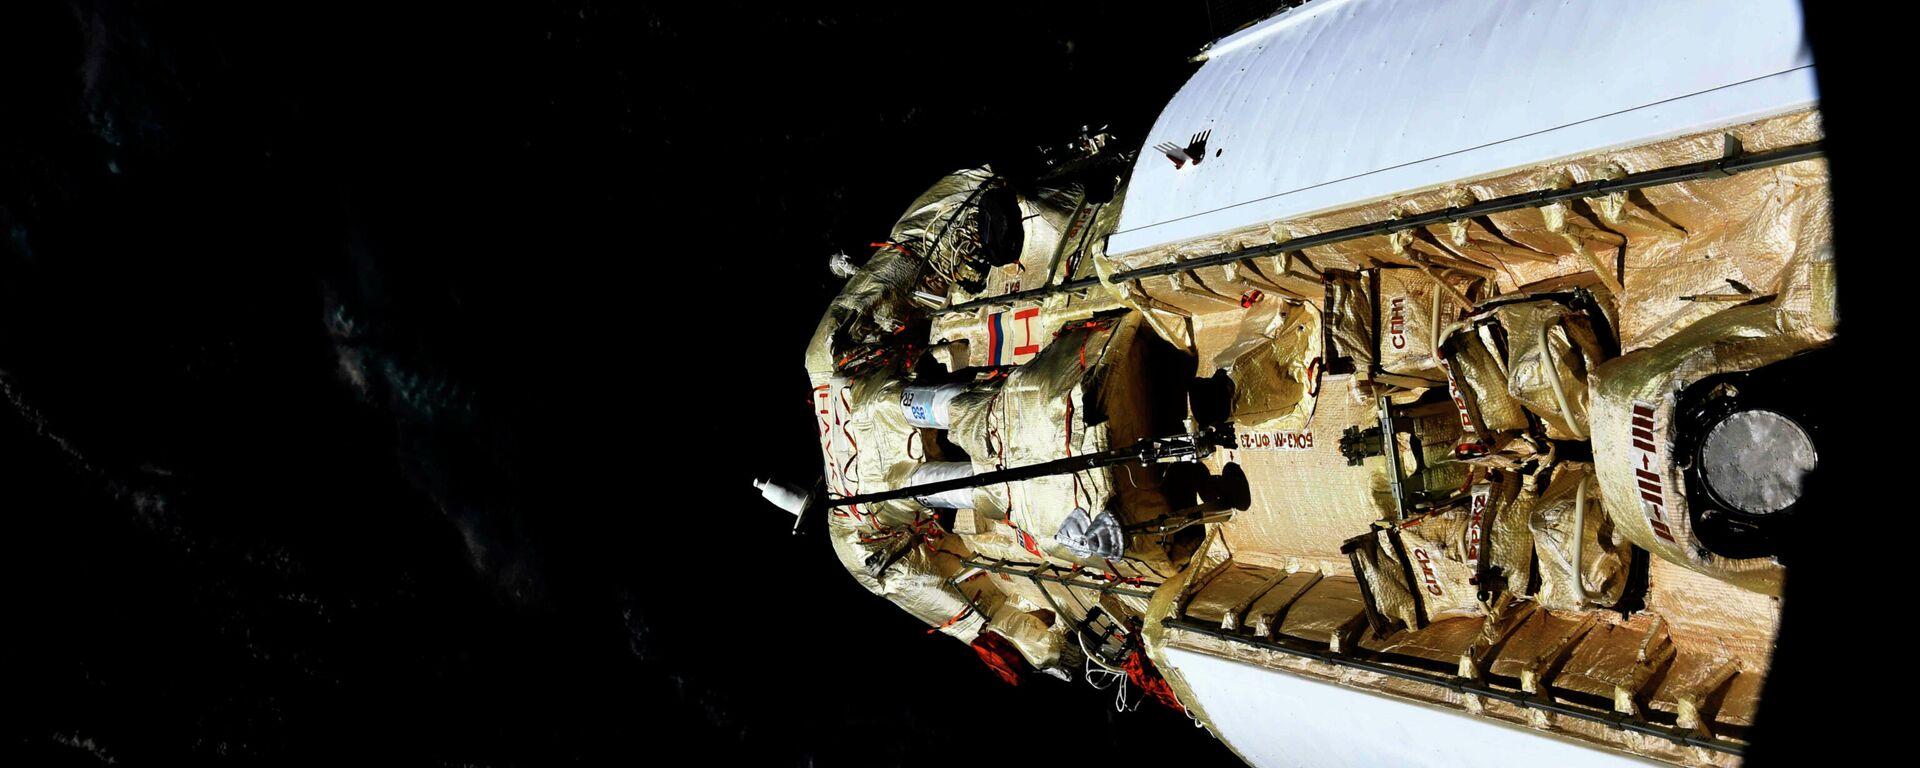 Russisches multifunktionales Forschungsmodul Pirs kurz vor dem Andocken an der ISS, 29. Juli 2021 - SNA, 1920, 29.07.2021